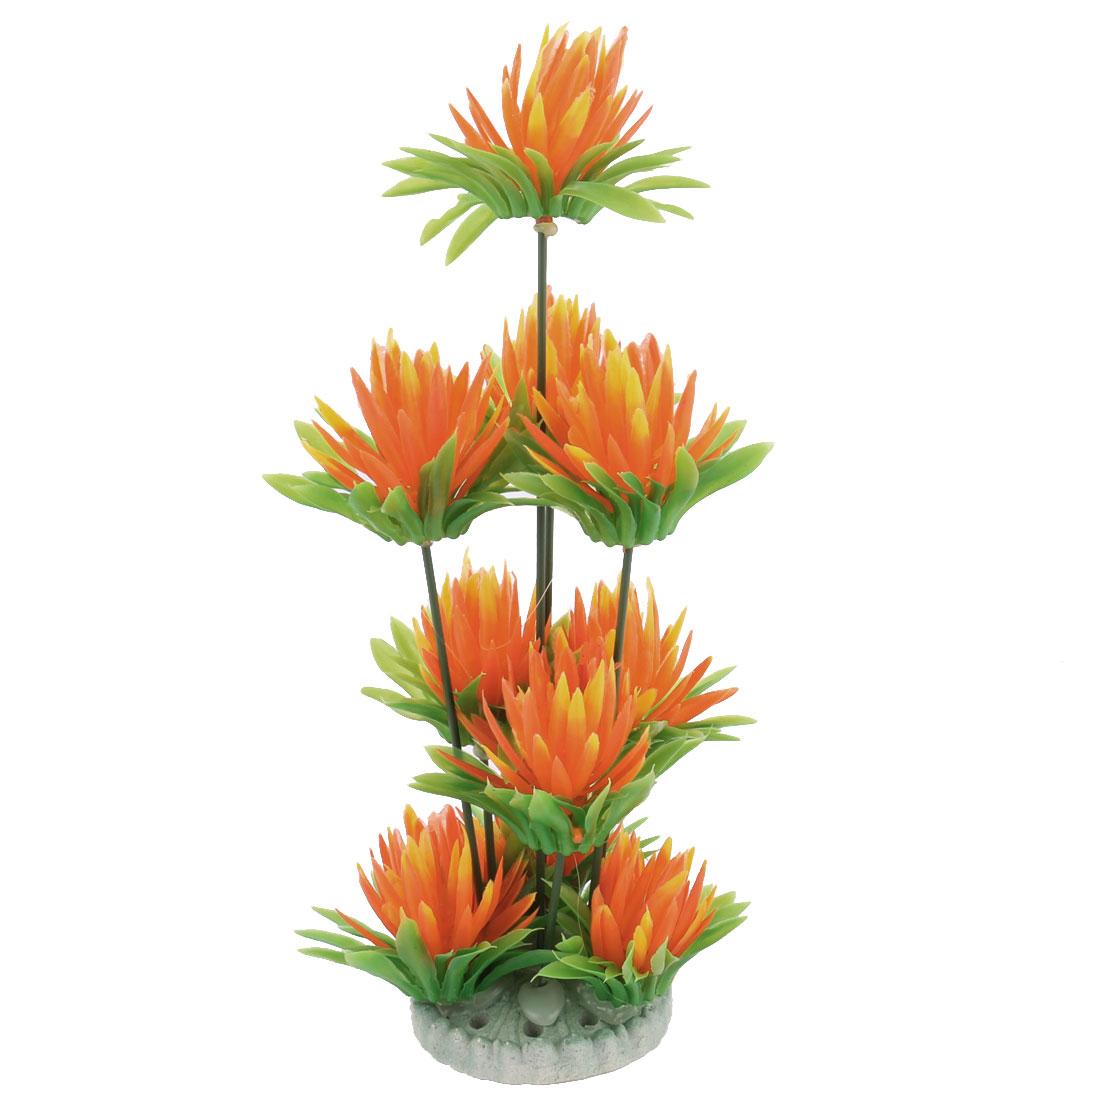 Aquarium-Fish-Tank-Artificial-Landscape-Flower-Plant-Ornament-Light-Green-Orange